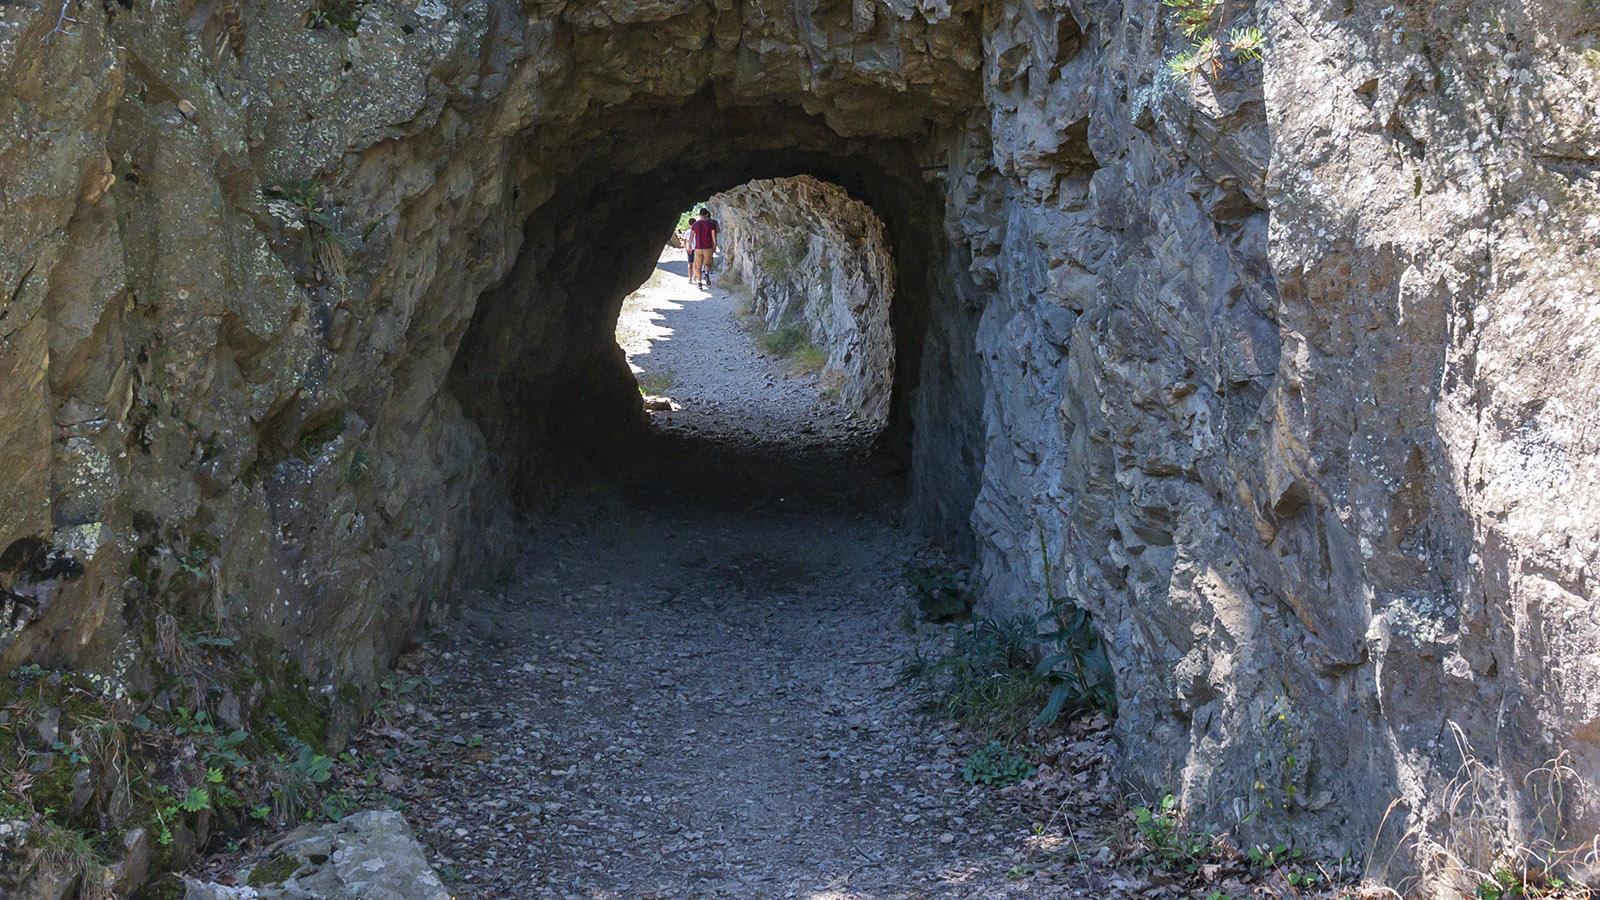 Hinter diesem Felstor beginnt der Hangweg. Foto: Hilke Maunder